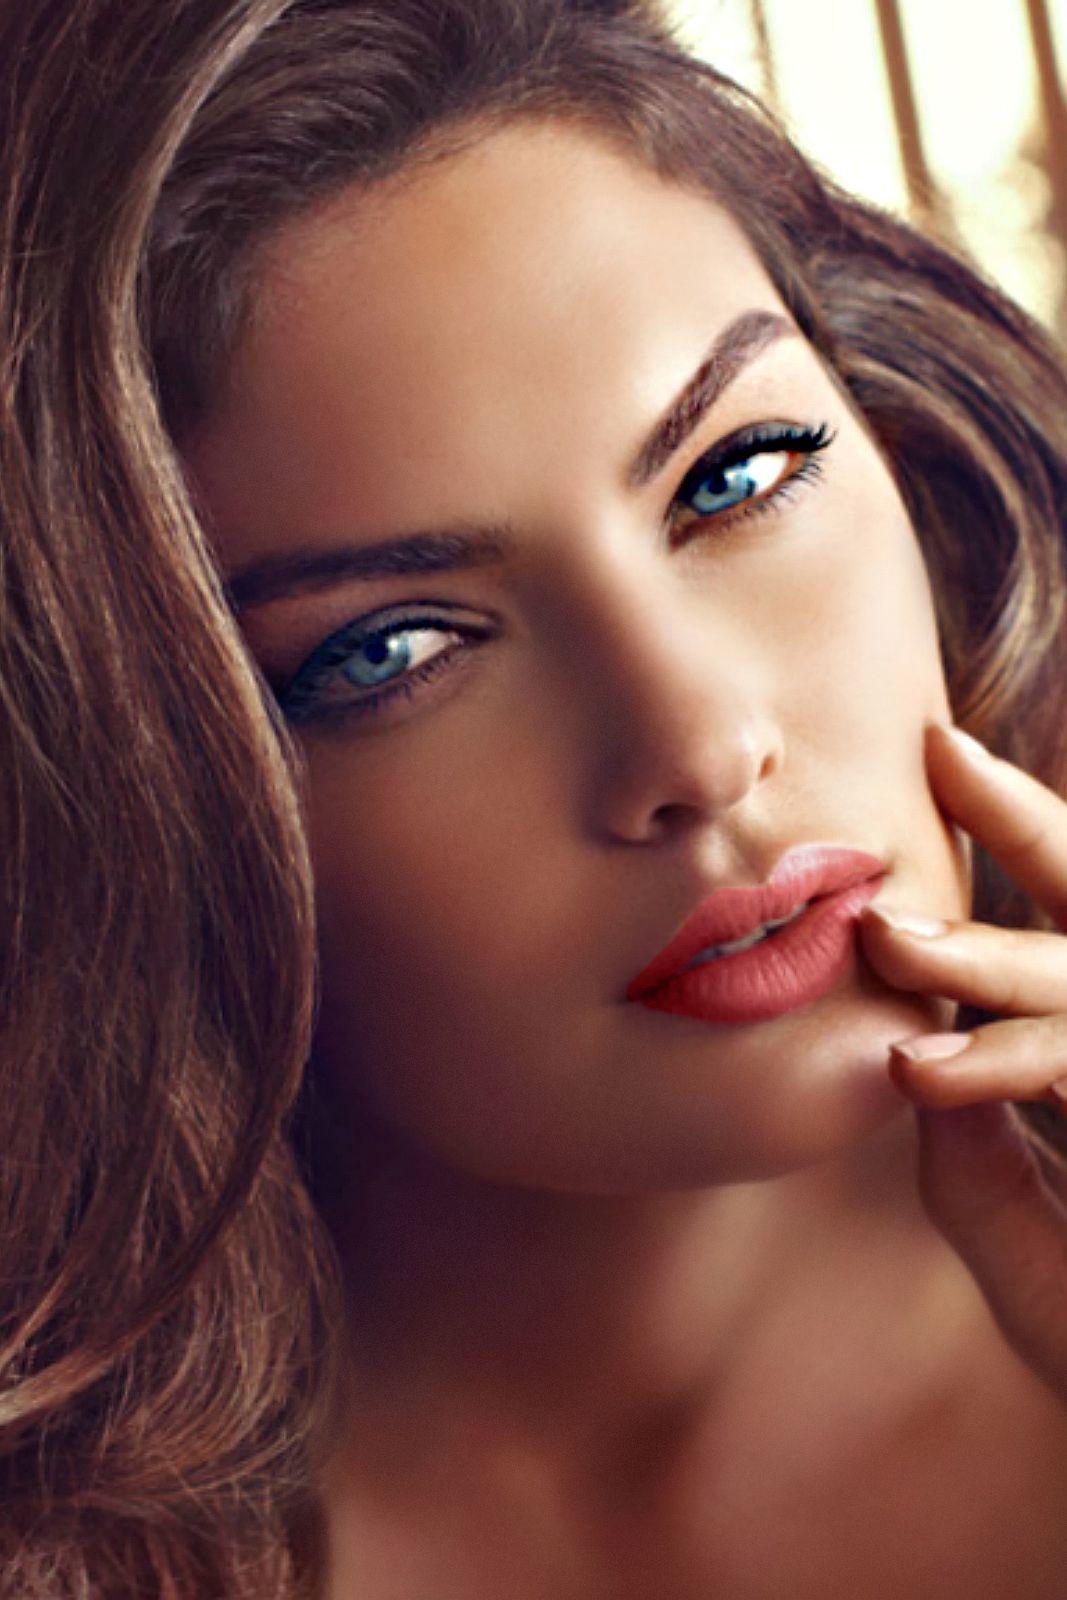 most beautiful women in the world - HD1067×1600